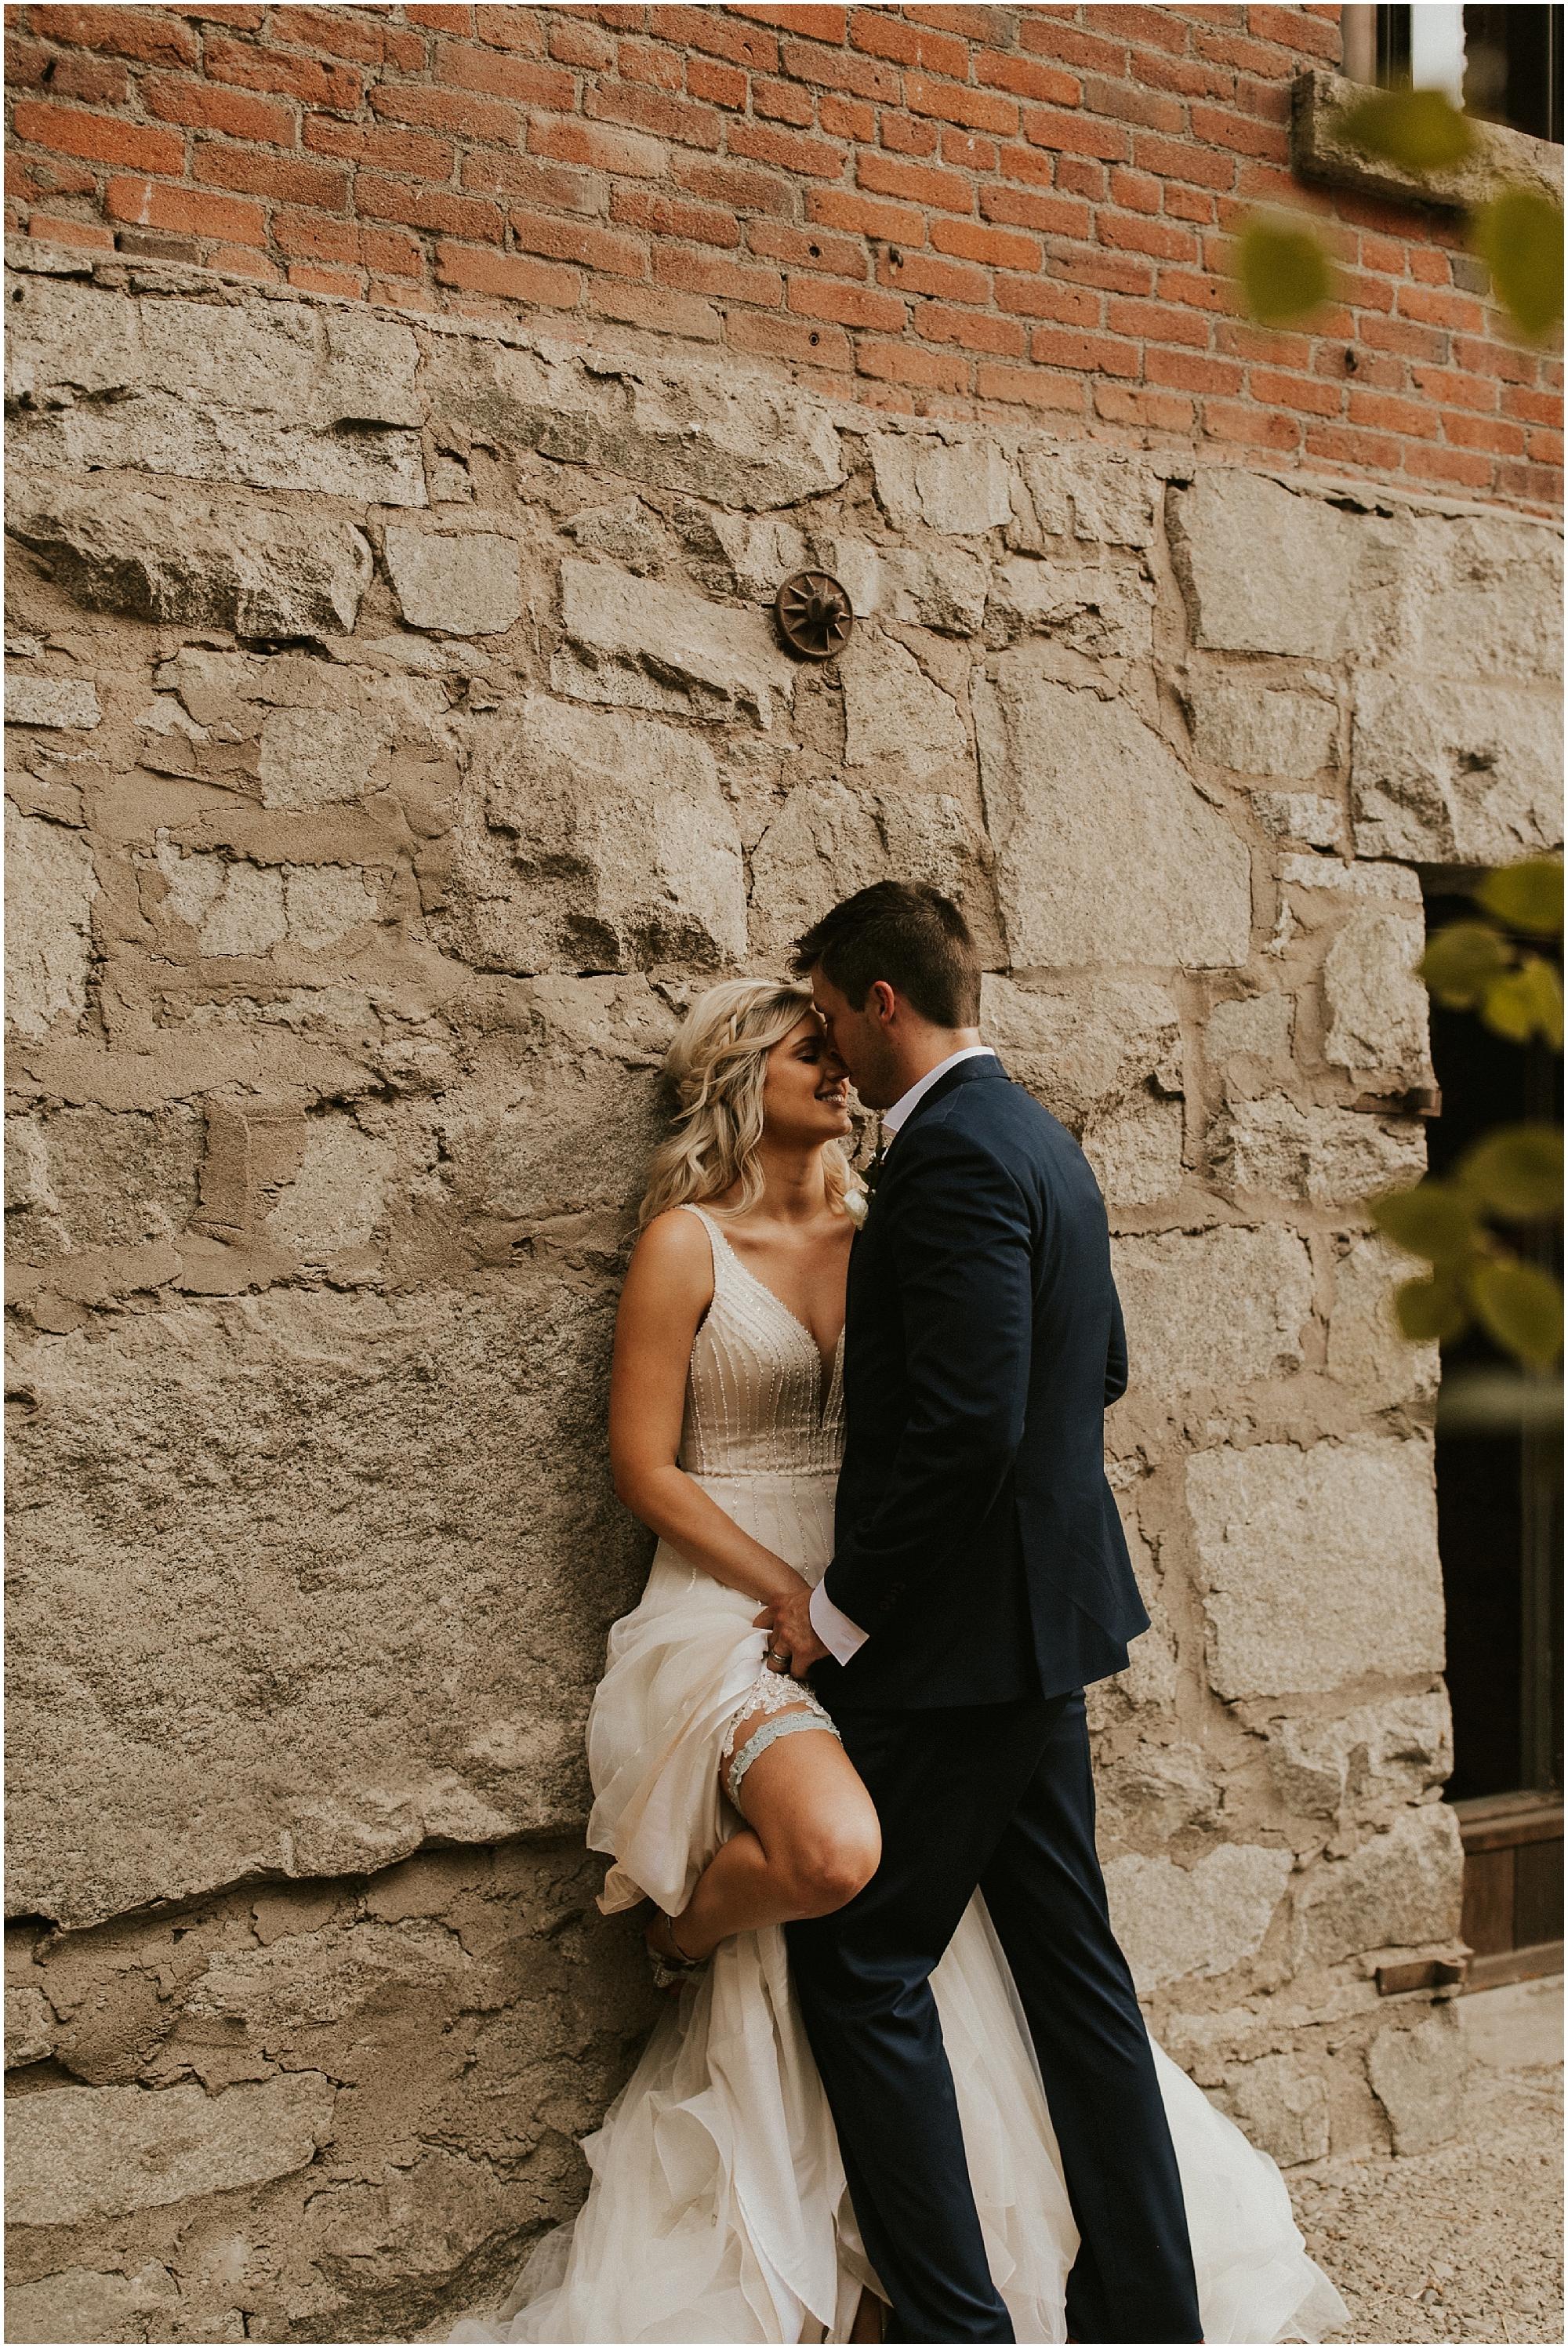 Chateau Rive Spokane Wedding Cassie Trottier Photography1115.jpg